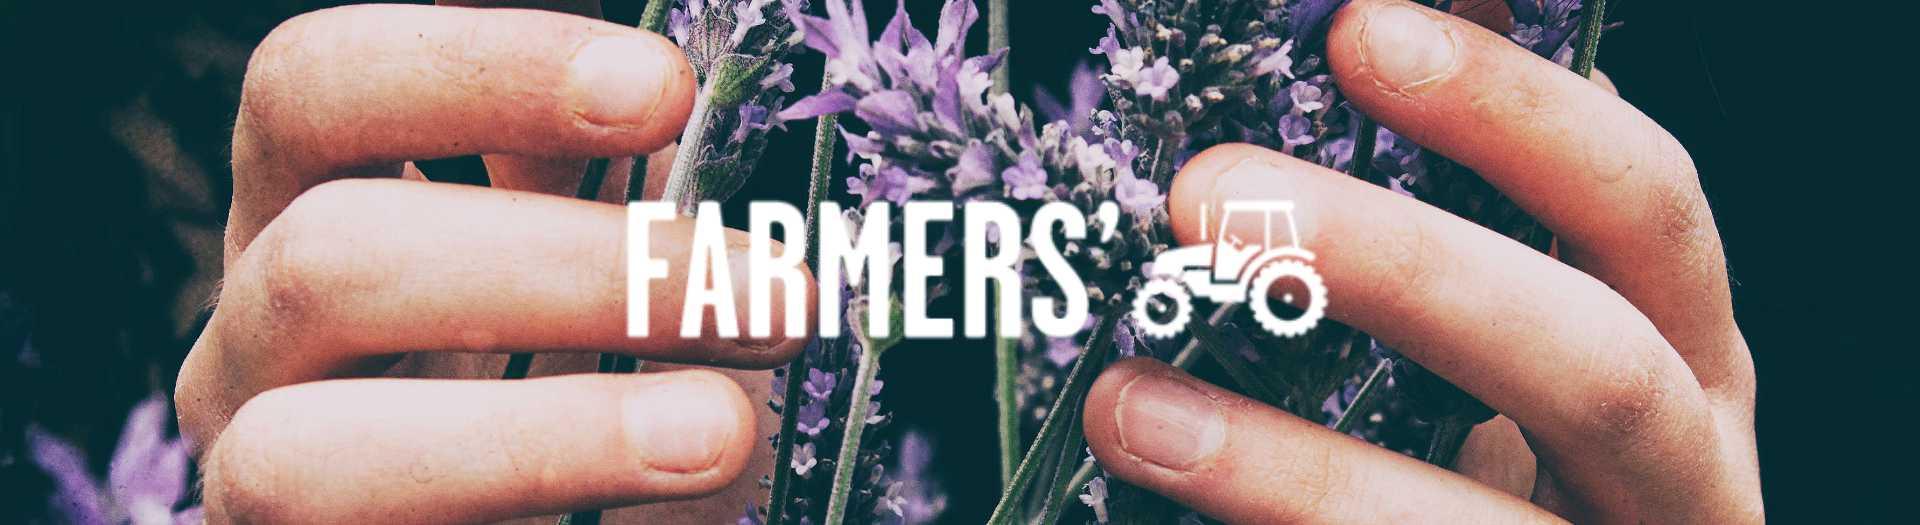 1920x525 farmers skincare header with logo